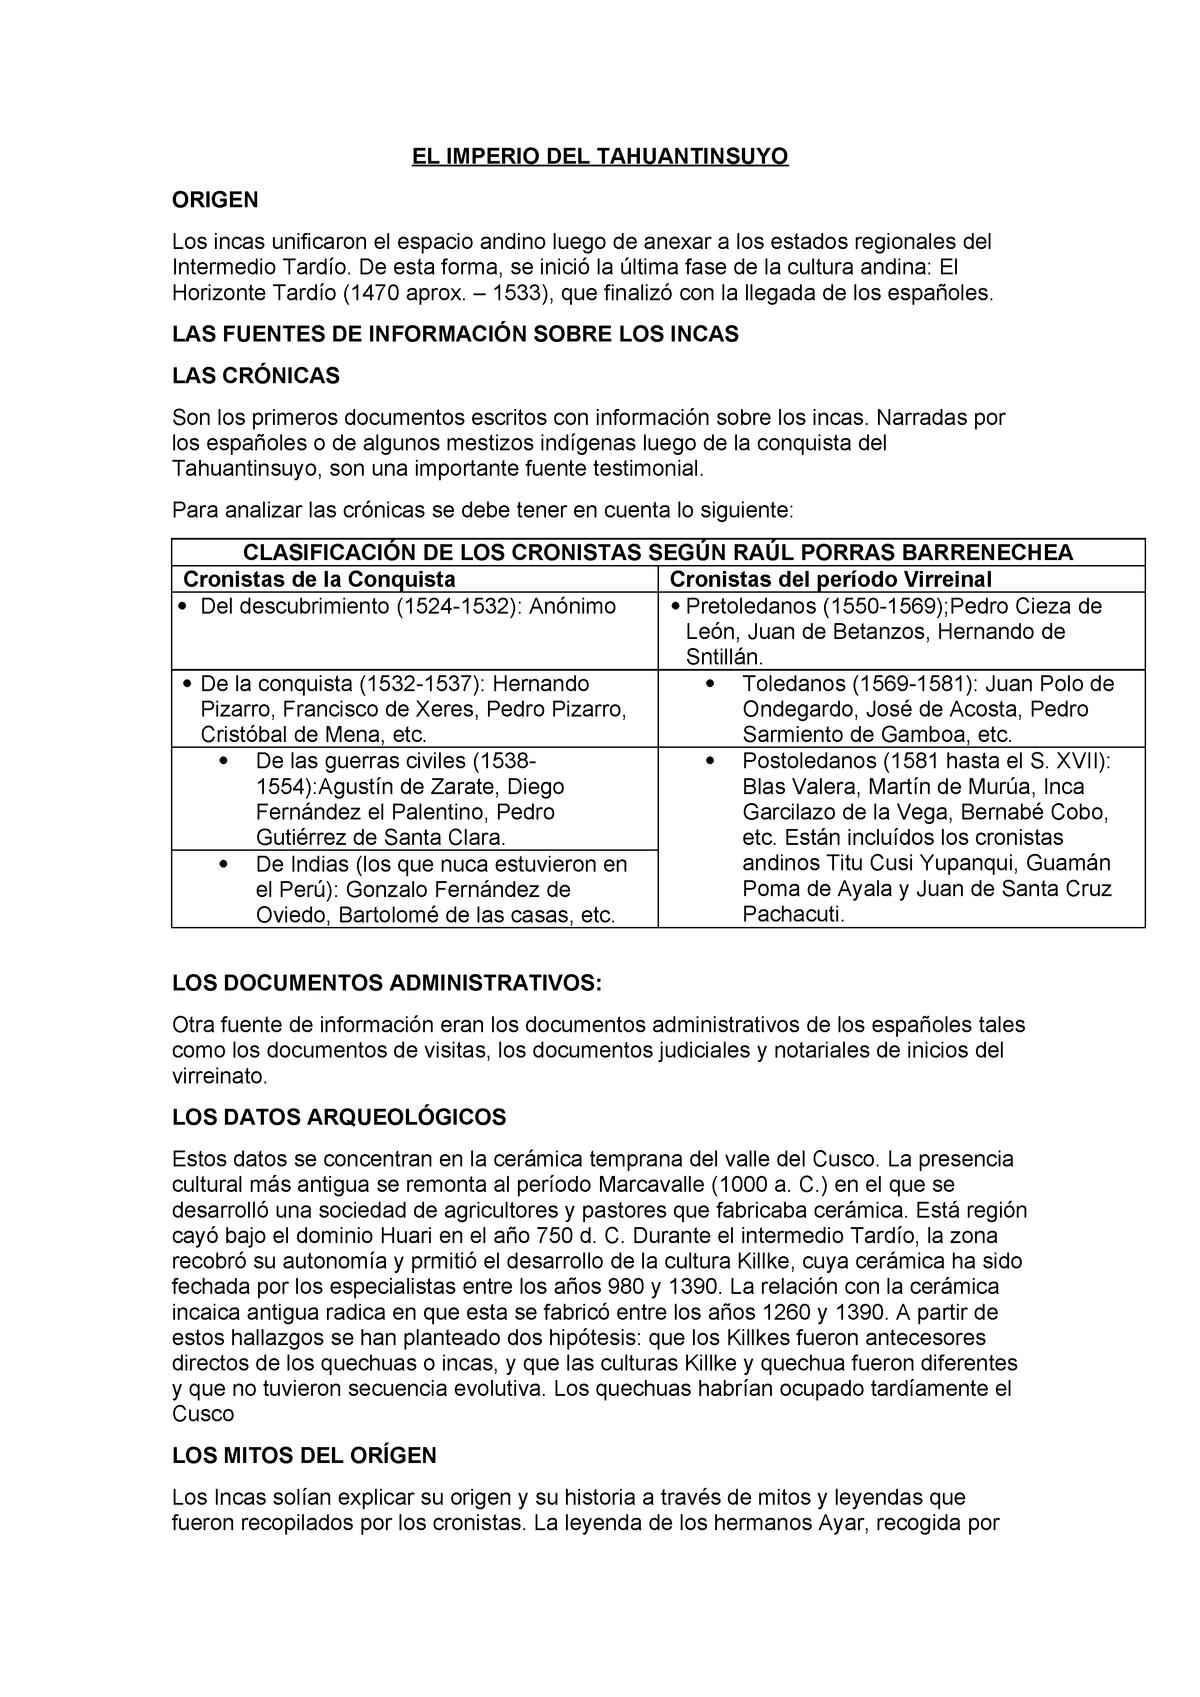 Historia Temas 1117Histologia Temas De Studocu De kXZTwOPui